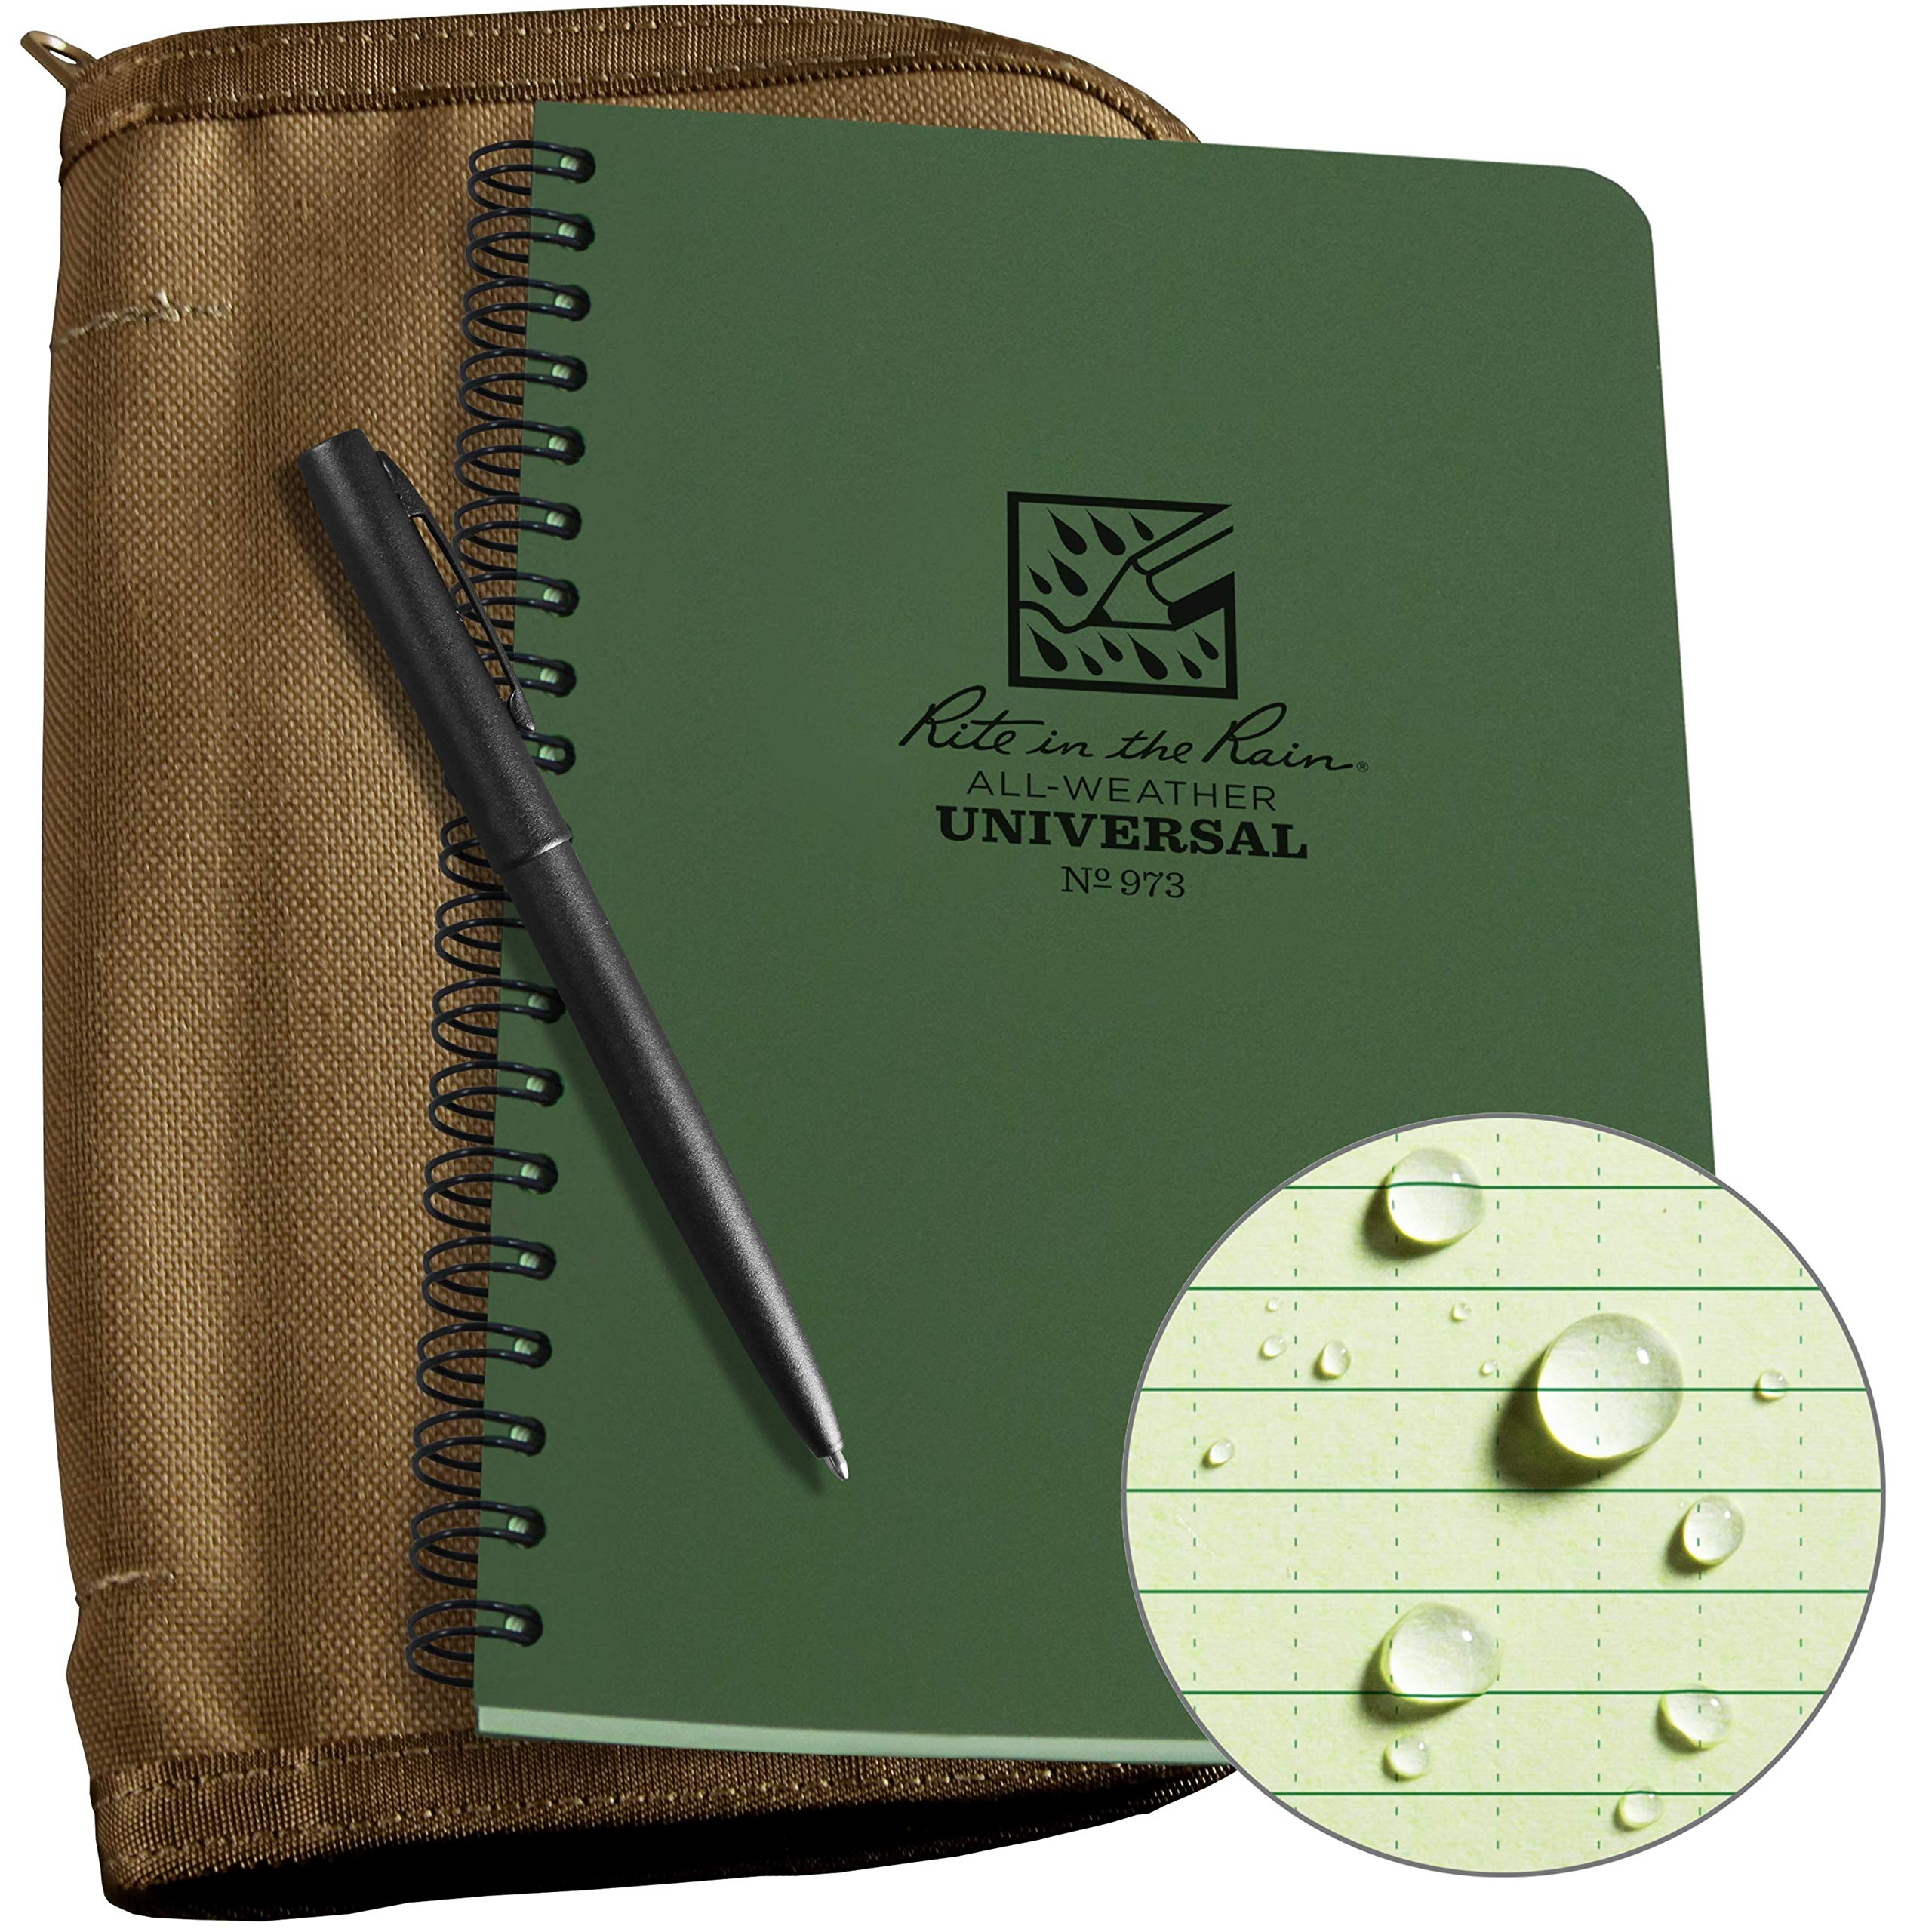 "Rite In The Rain Weatherproof Side Spiral Kit: Tan CORDURA Fabric Cover, 4.625"" x 7"" Green Notebook, and Weatherproof Pen (No. 973-KIT), 8.5 x 5.5 x 0.625"